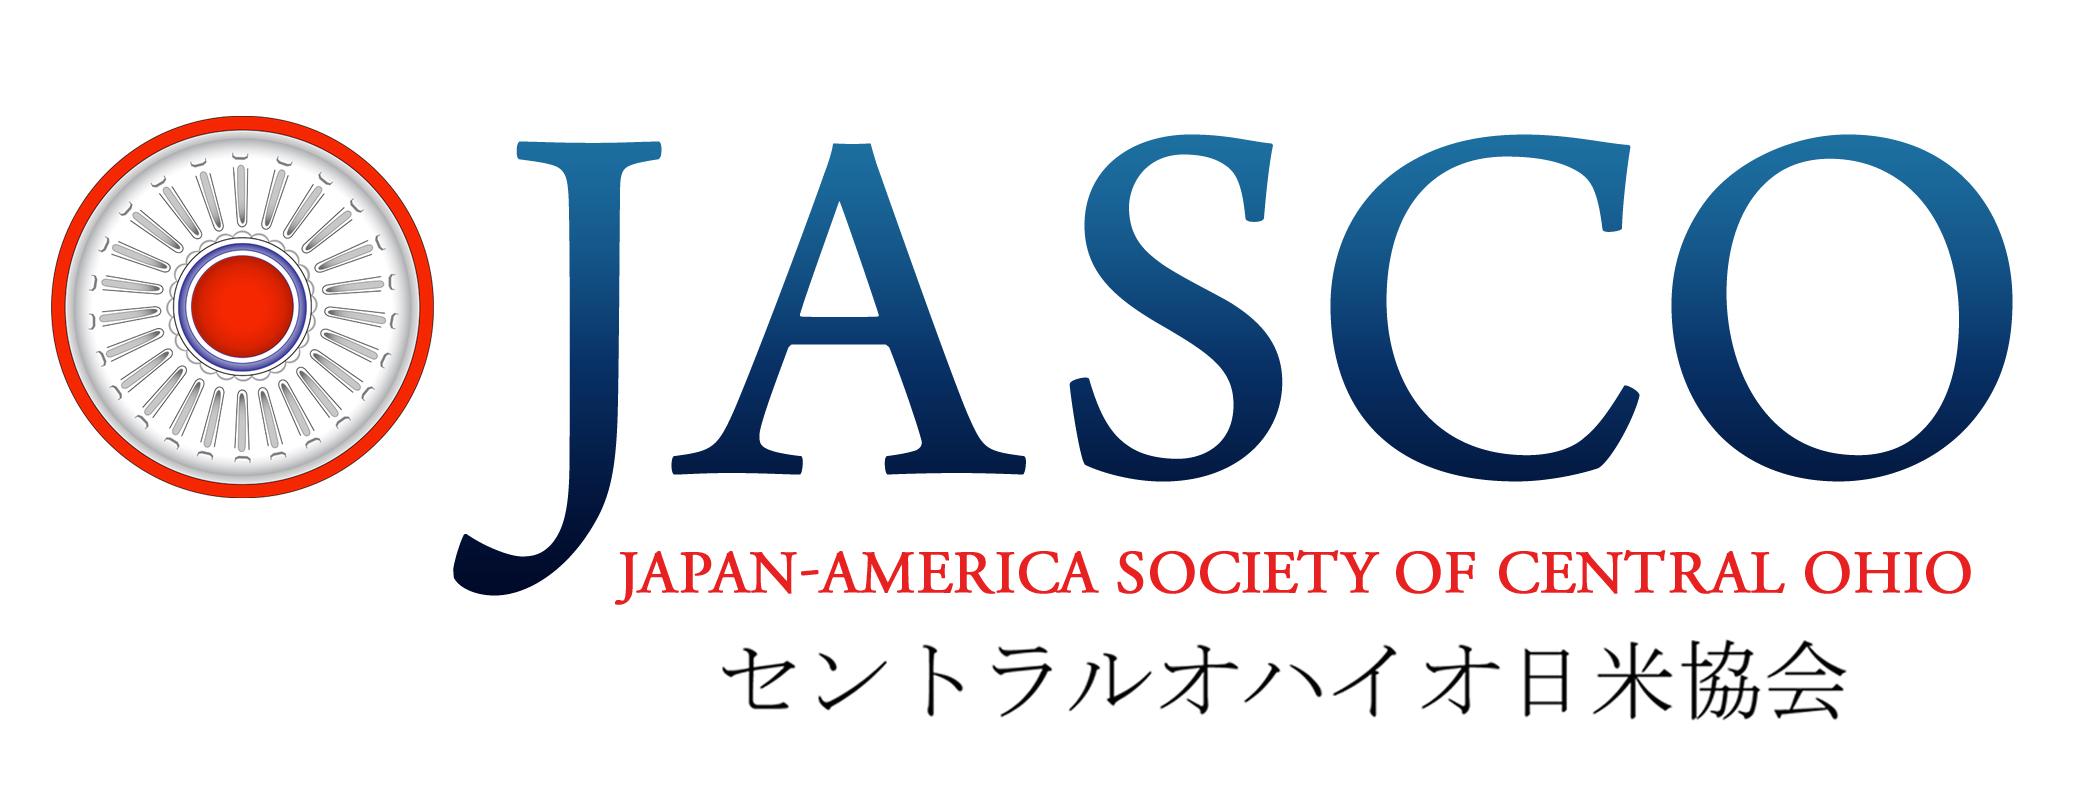 Tanabata Festival Volunteer Form 七夕祭りボランティアフォーム